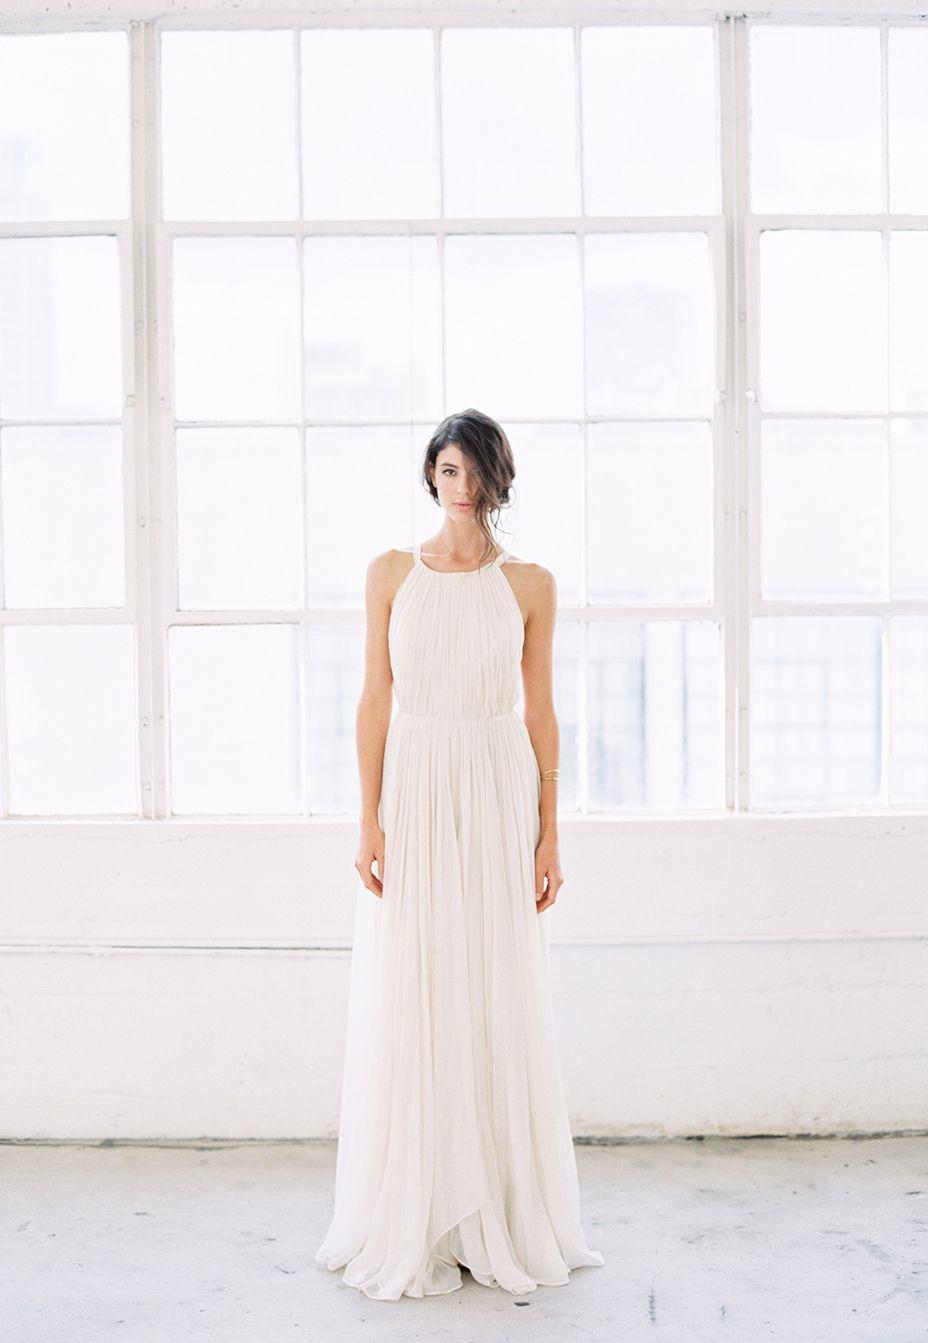 15-modern-grecian-wedding-gown | The Modern Bride | Dresses | Gowns ...